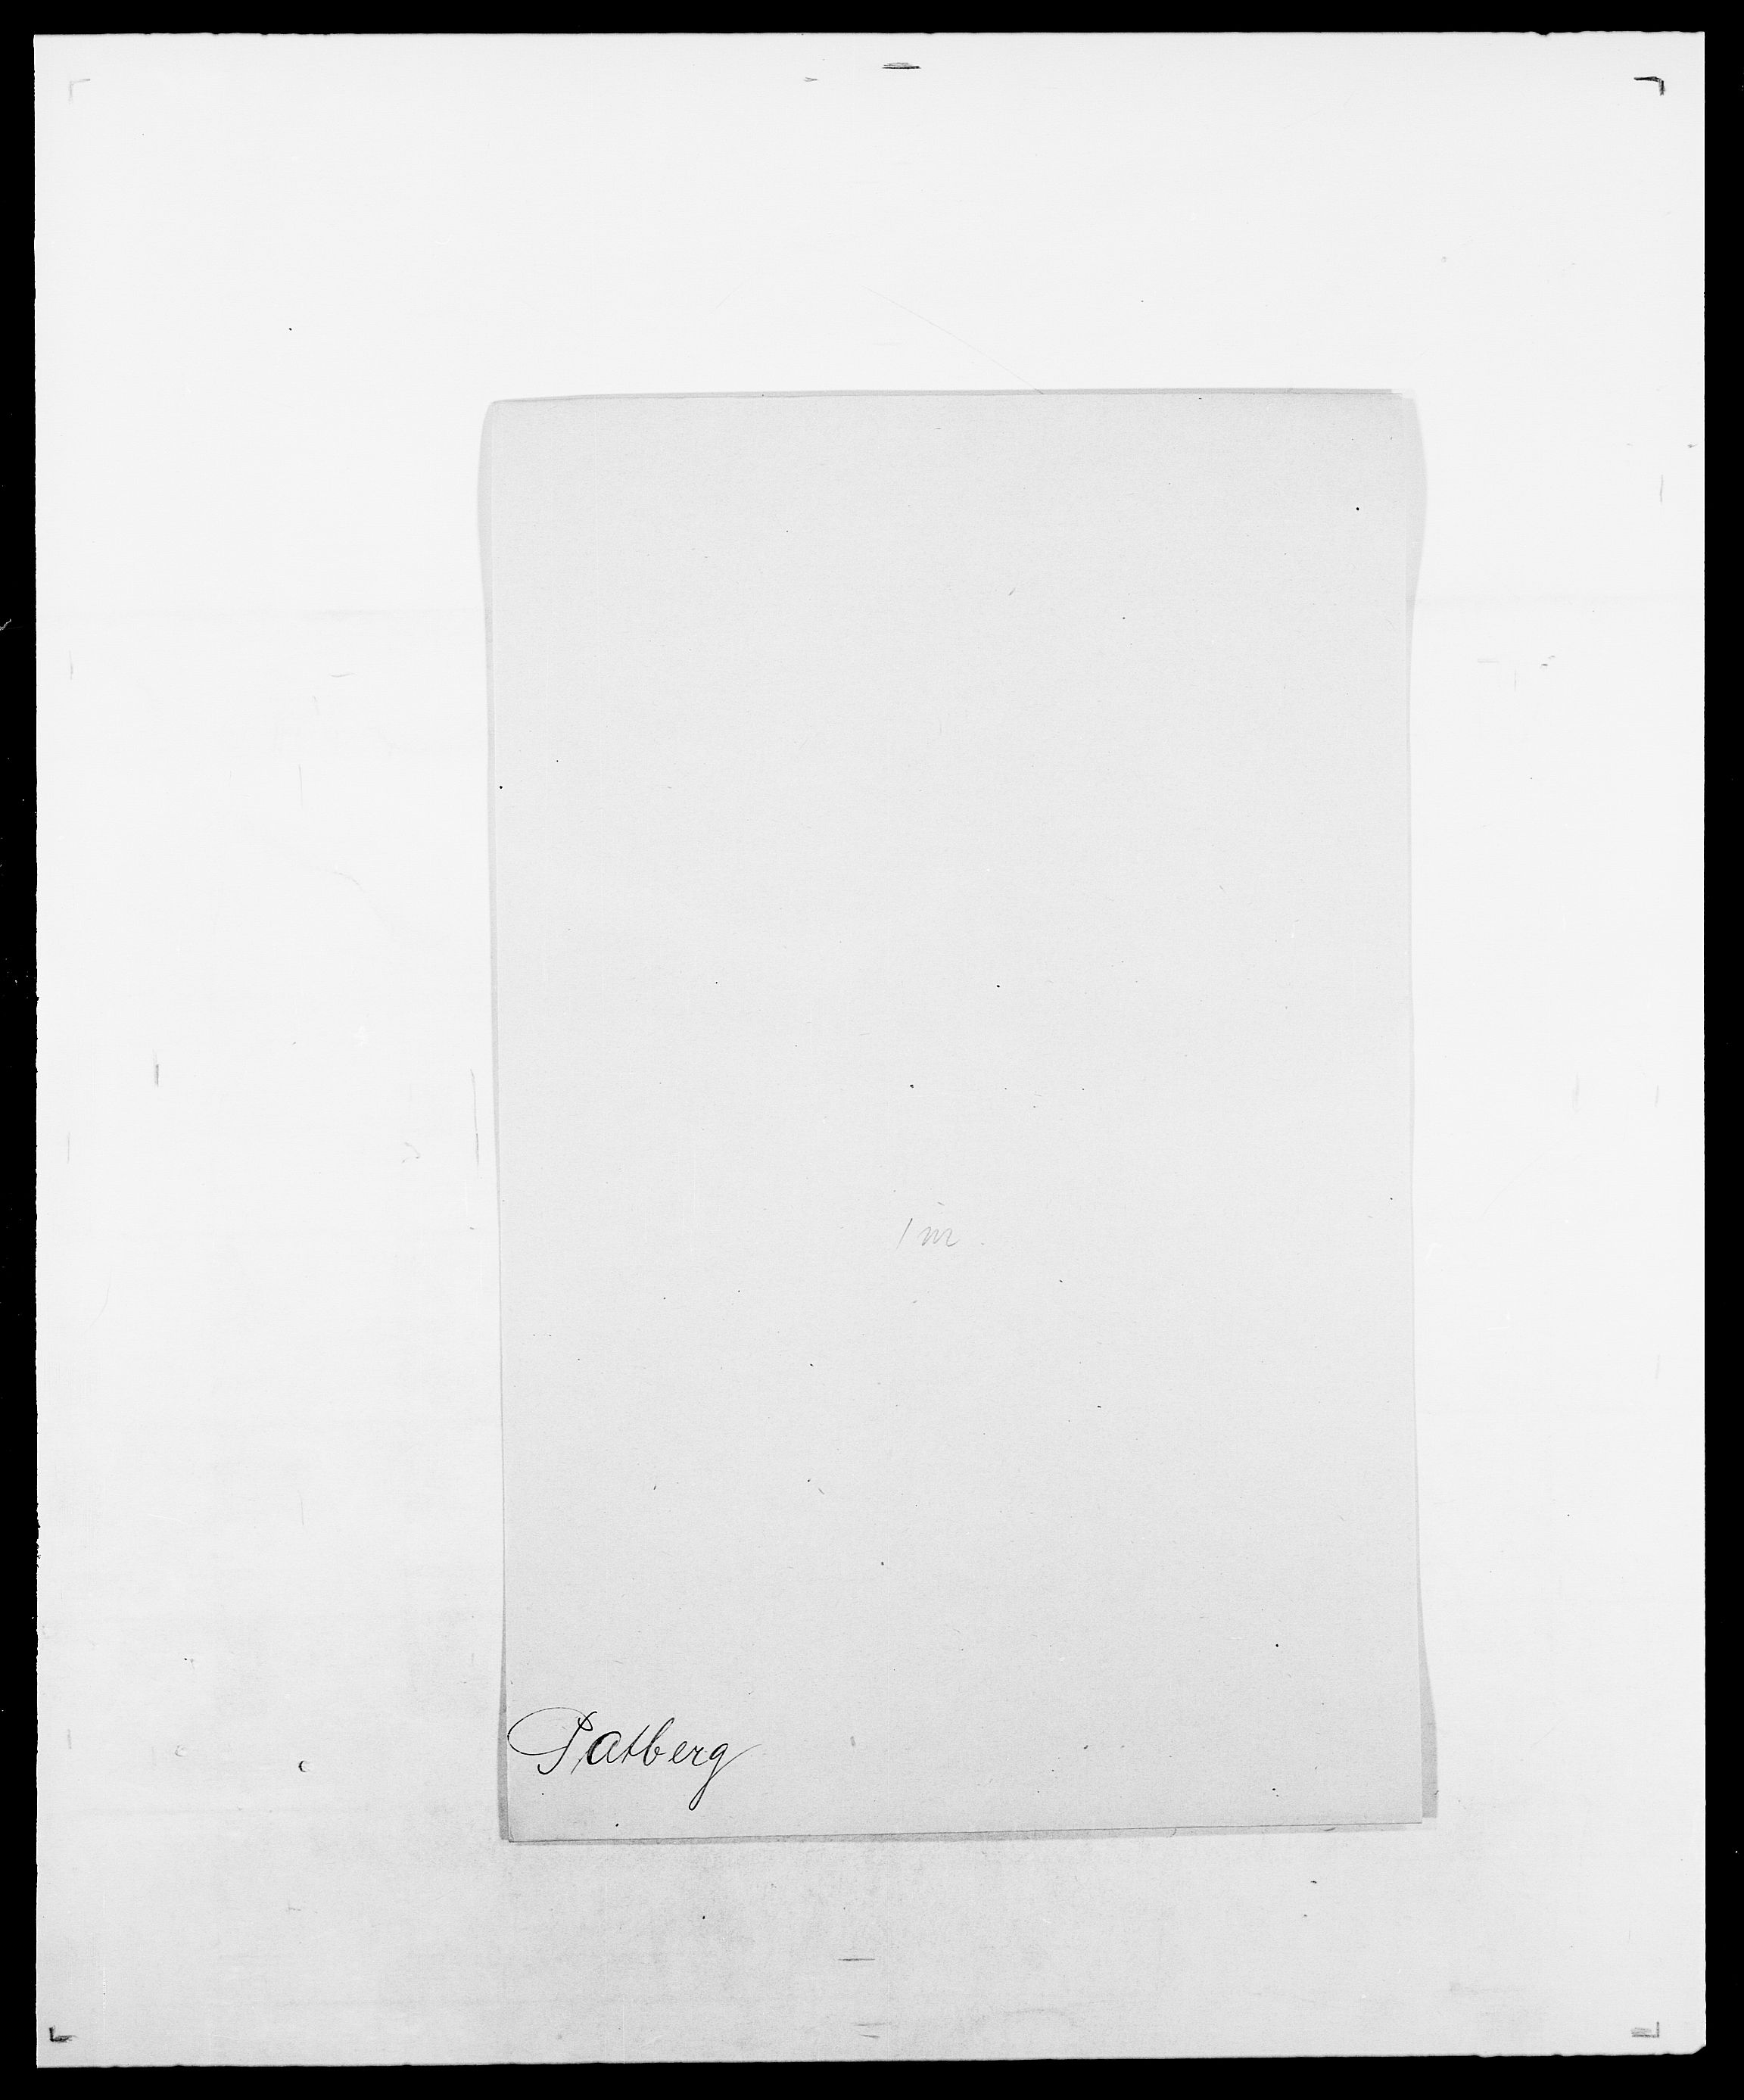 SAO, Delgobe, Charles Antoine - samling, D/Da/L0030: Paars - Pittelkov, s. 147